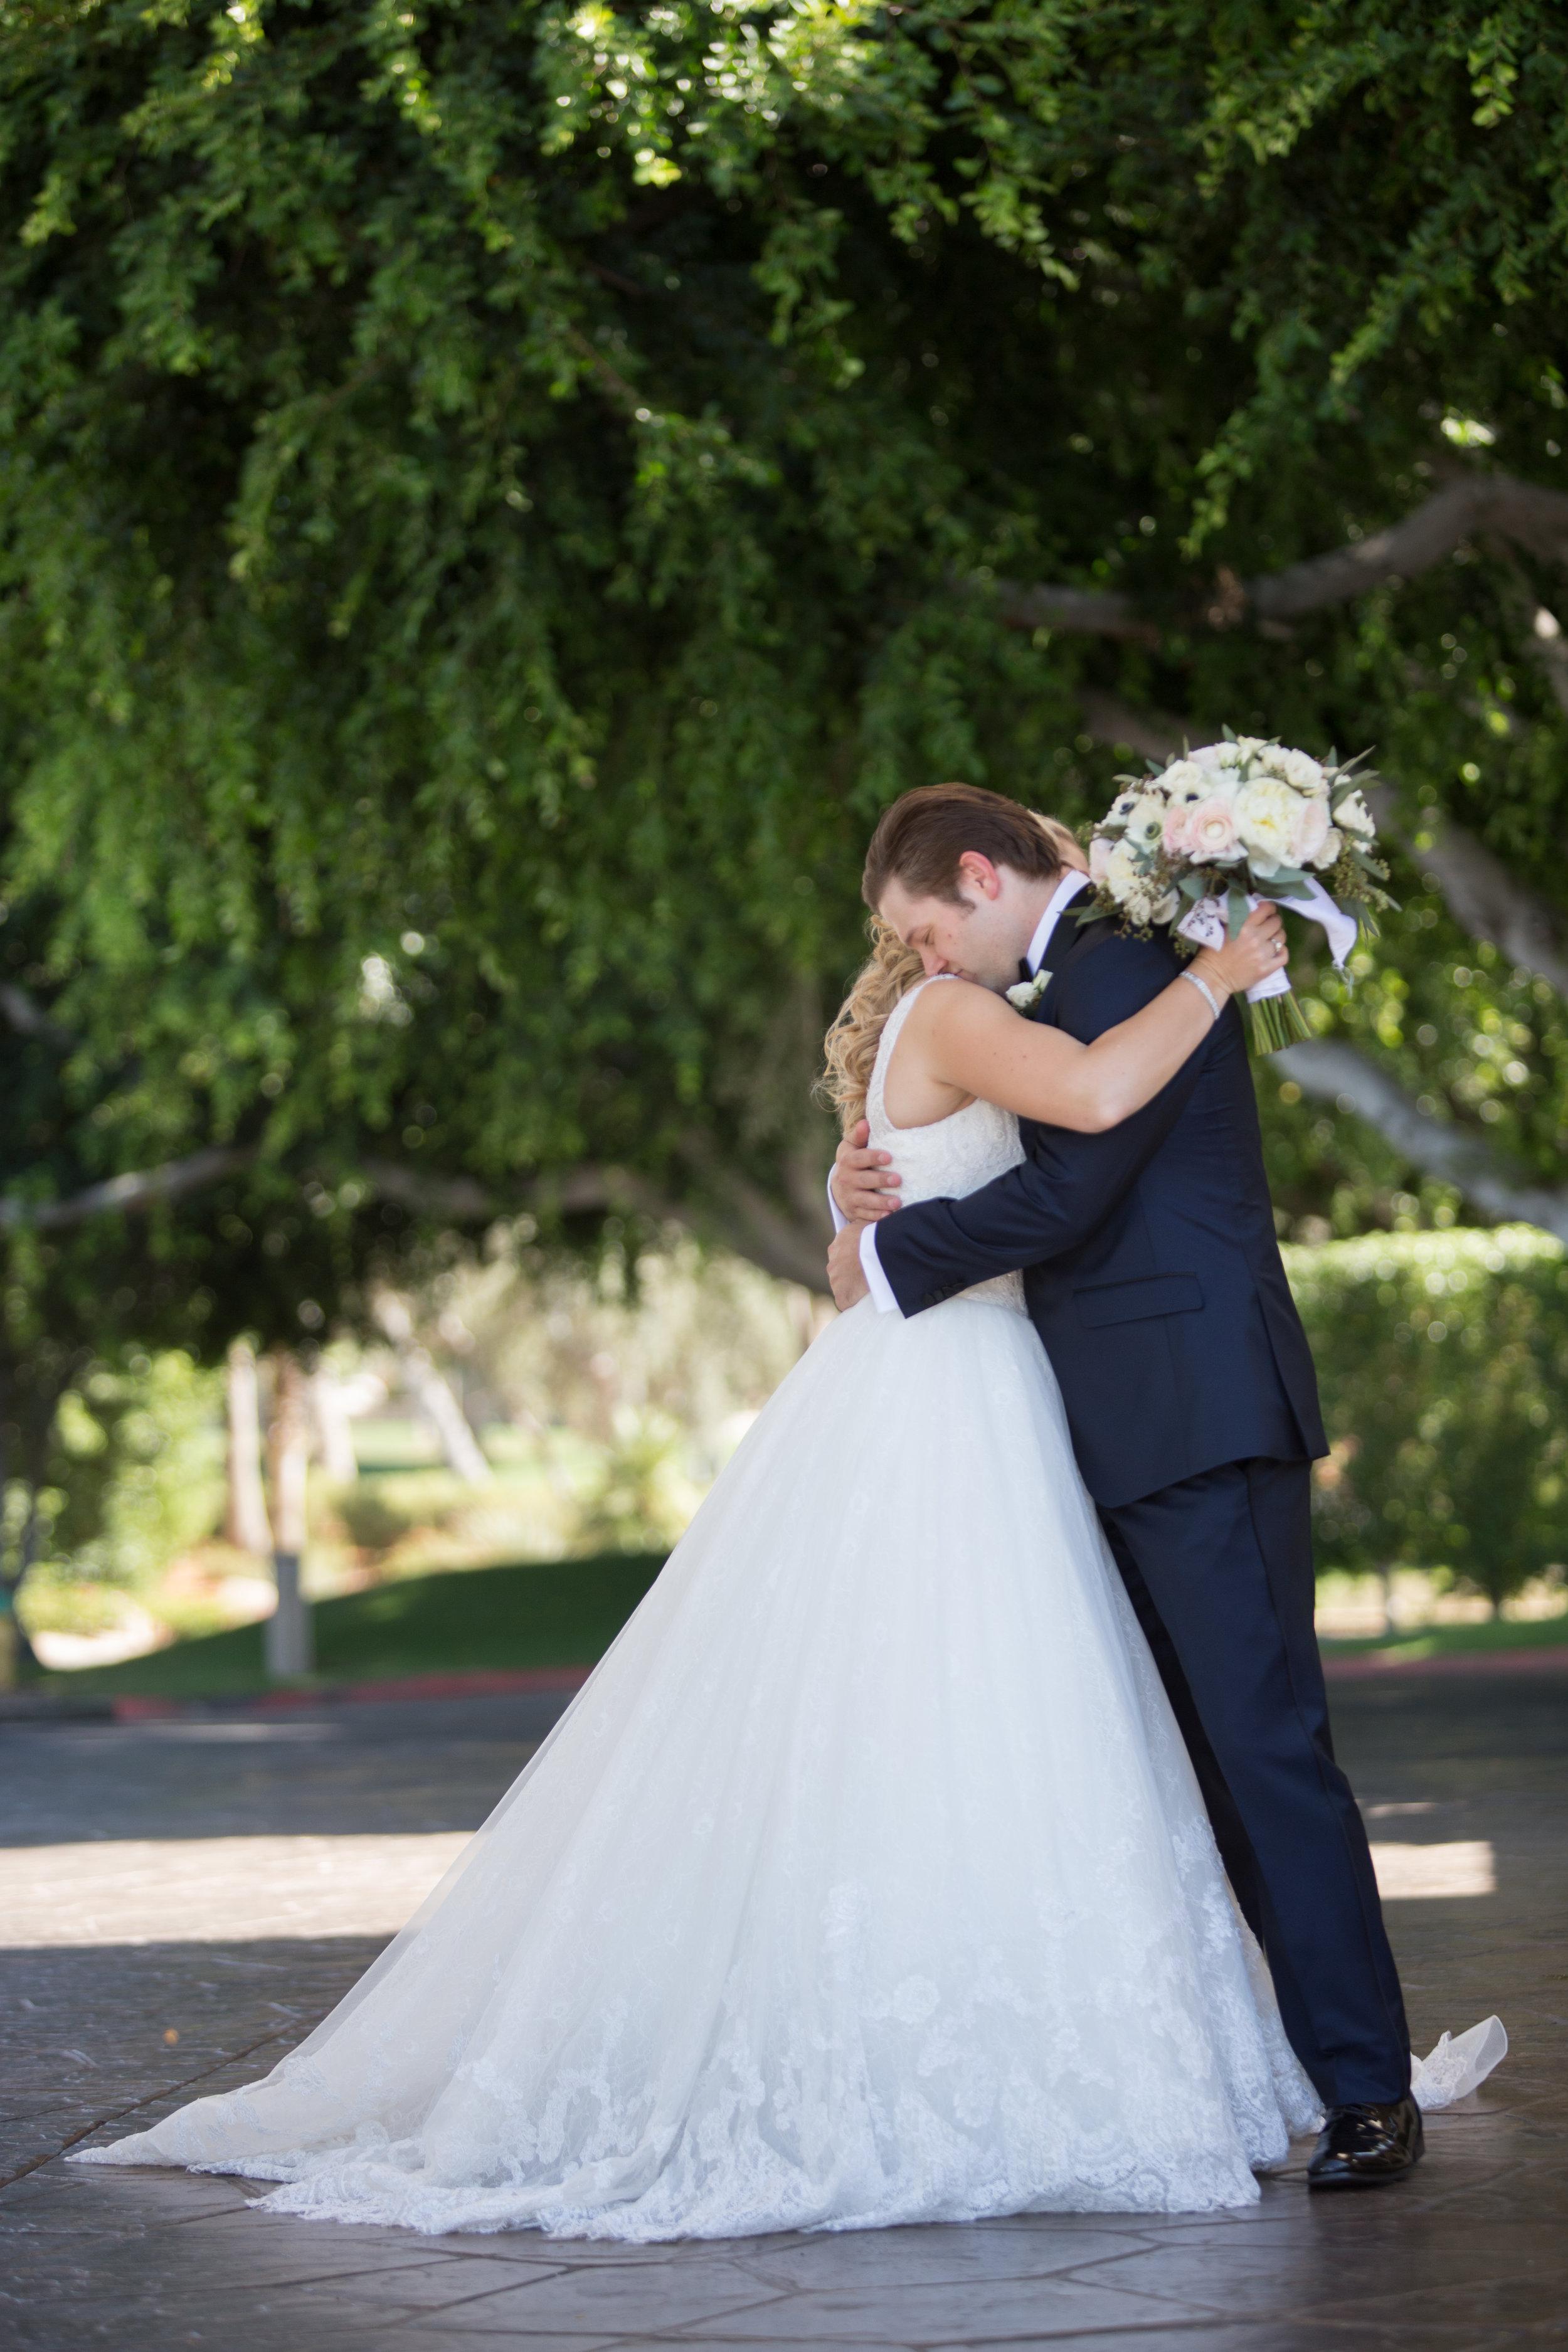 jinza-bridal-ball-gown-boat-neck.jpg